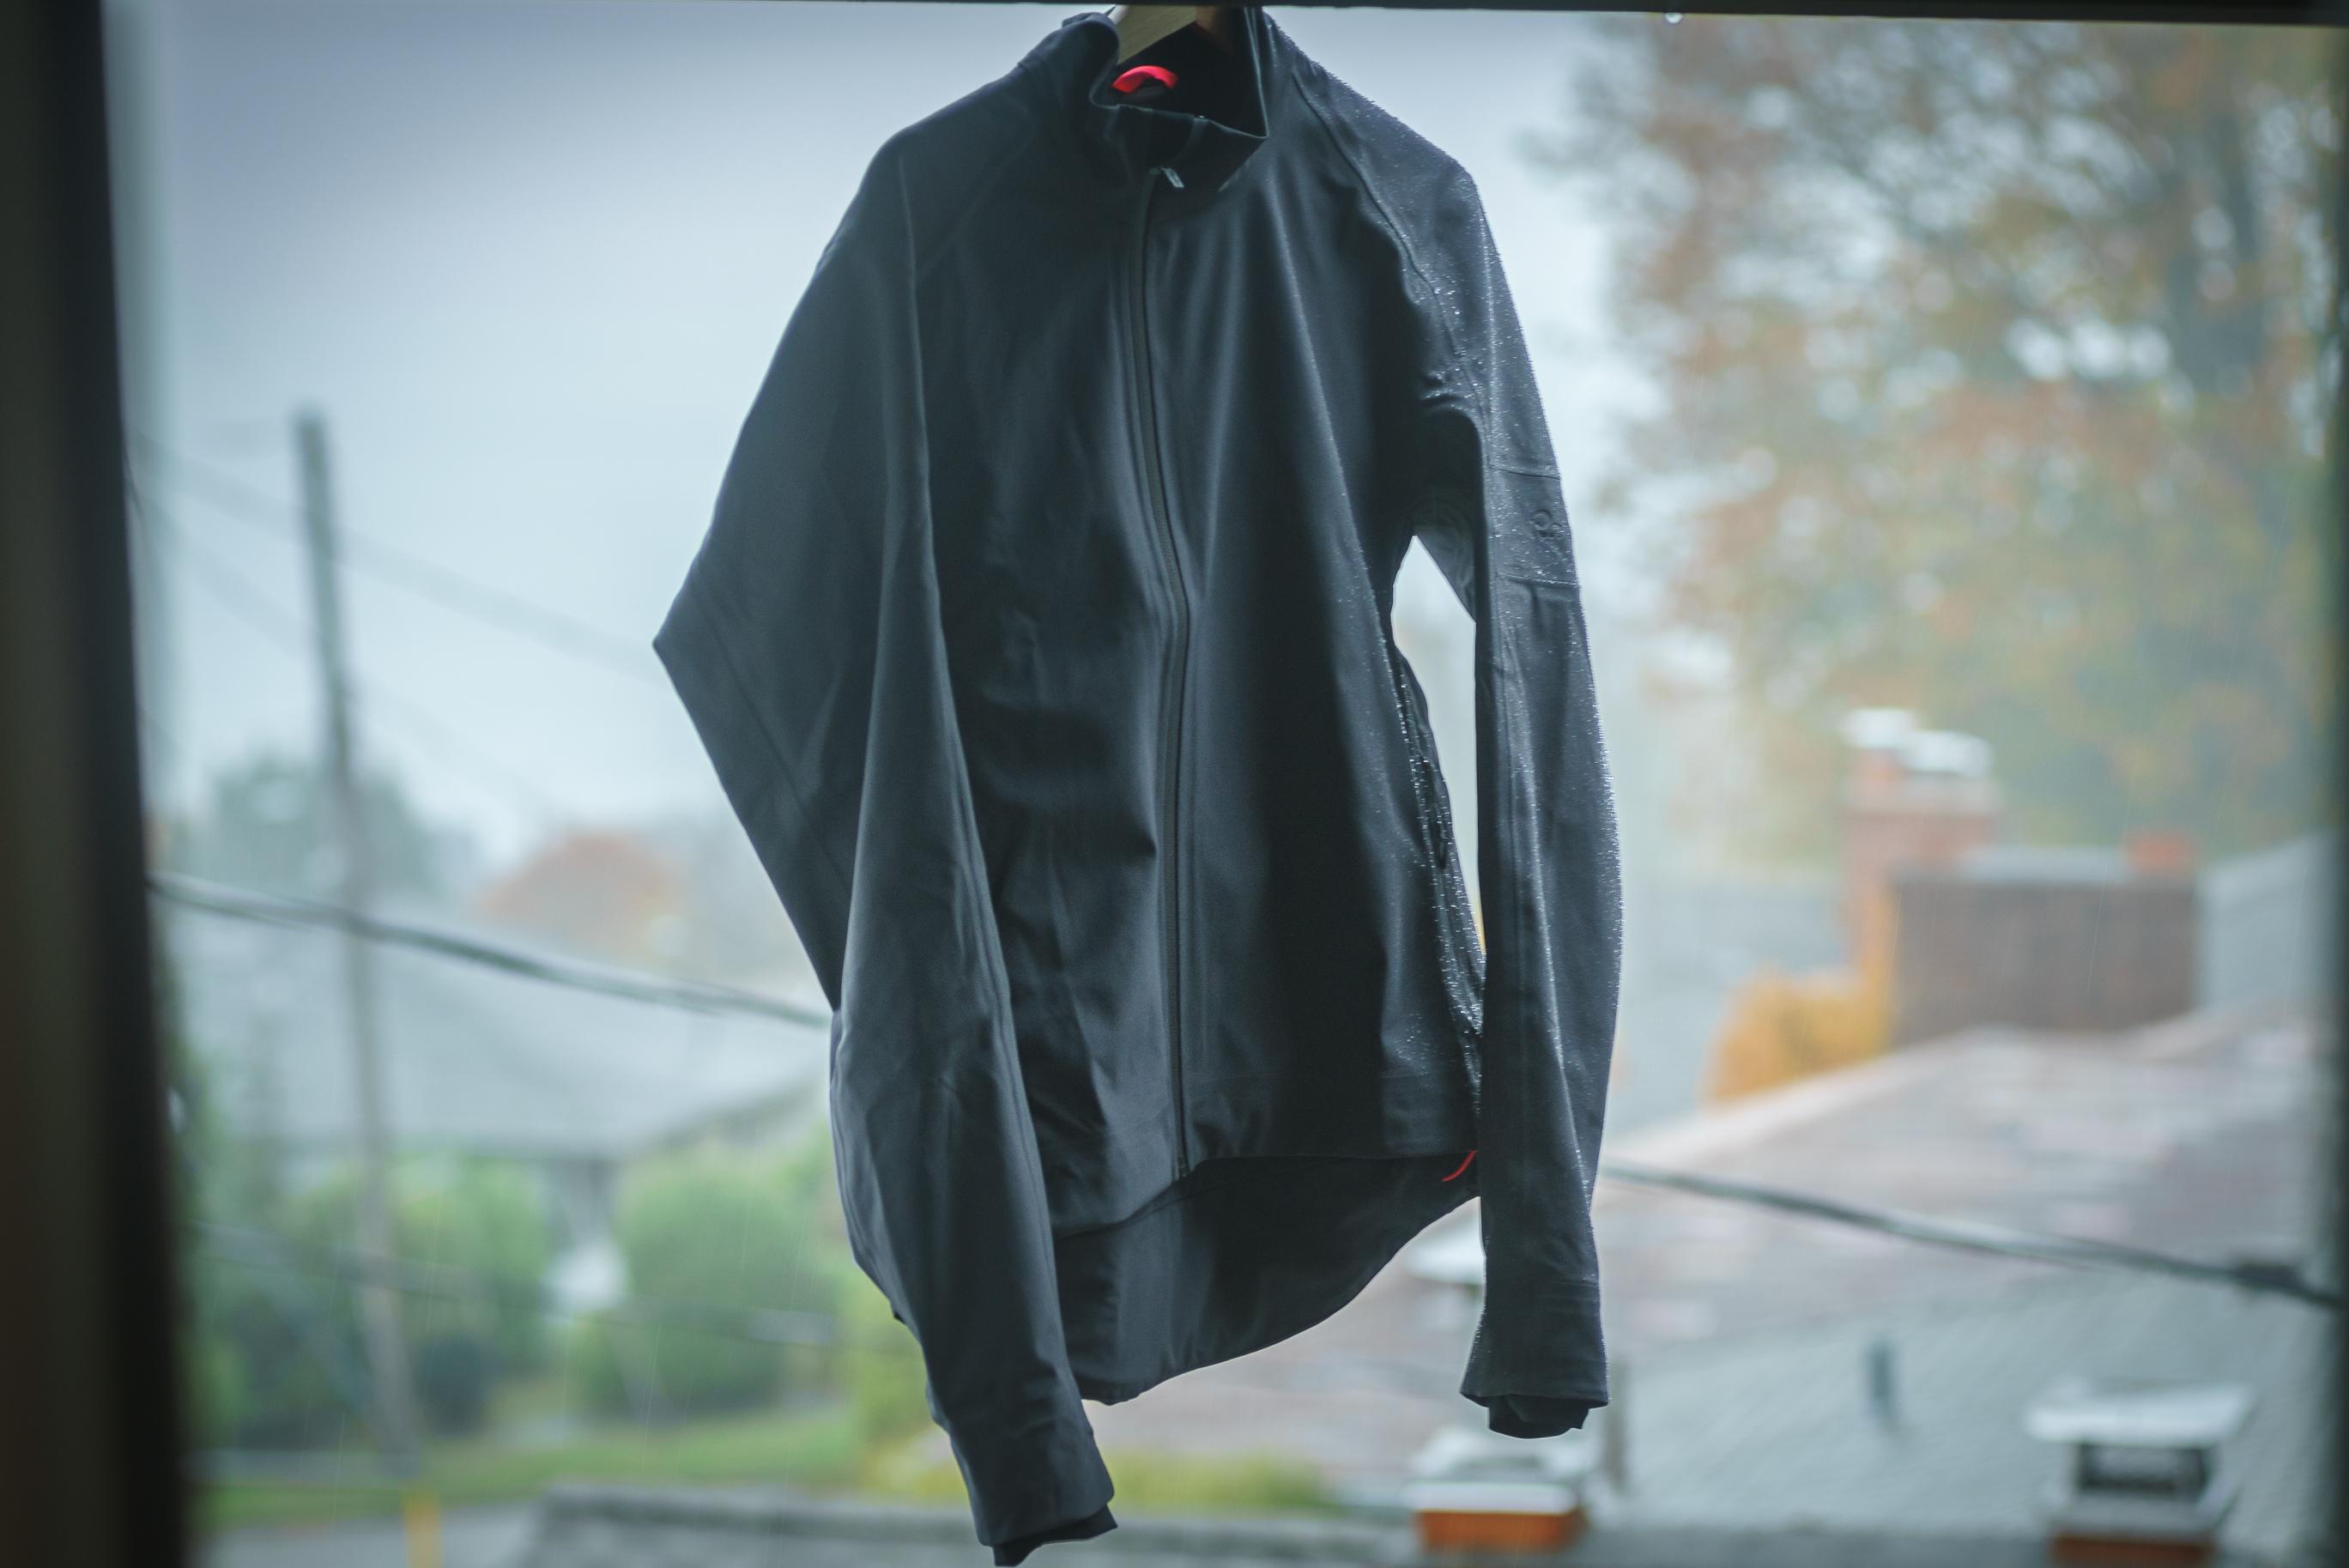 dreeping_jacket_rapha-4